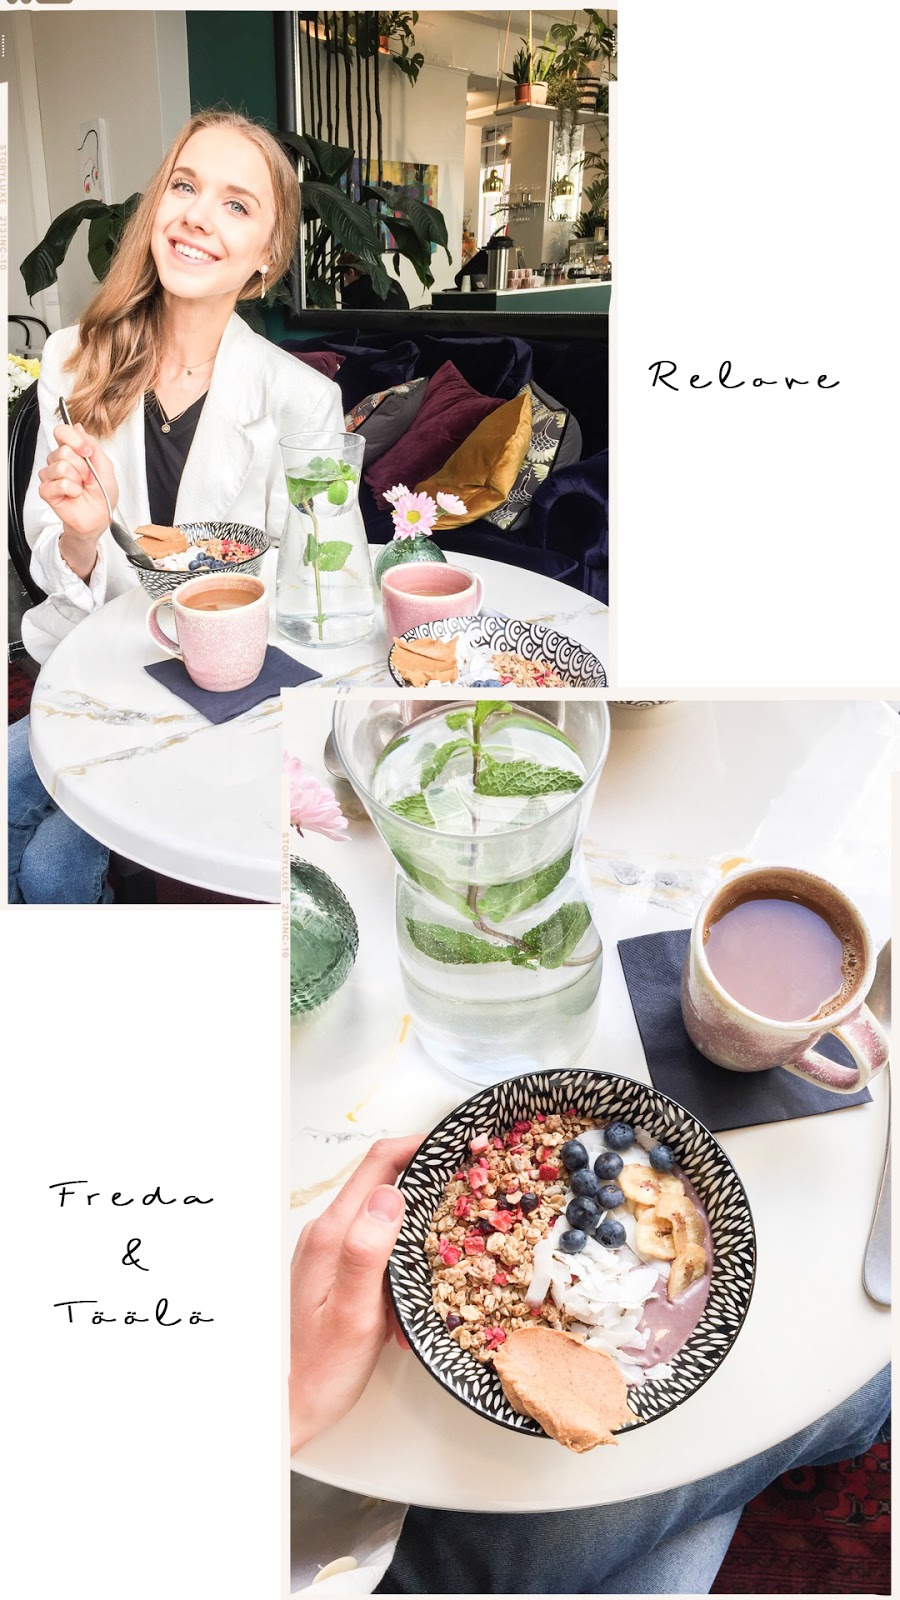 Cafes in Helsinki: Relove - Helsingin kahvilat: Relove